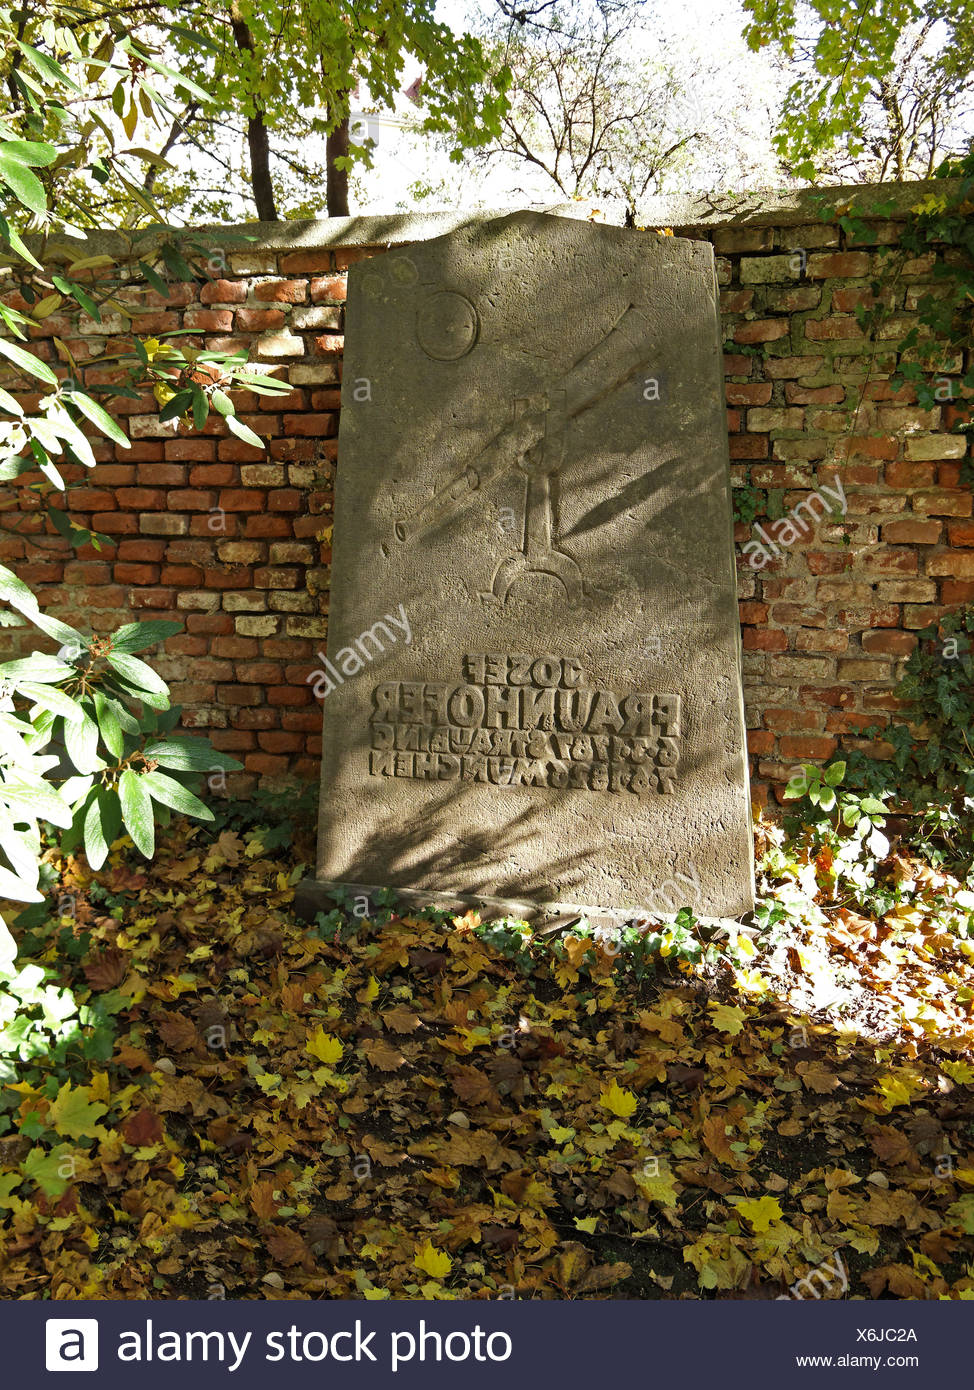 Grave of Josef Fraunhofer, 1787-1826, optician, Southern Cemetery Munich, Upper Bavaria, Bavaria, Germany, Europe - Stock Image